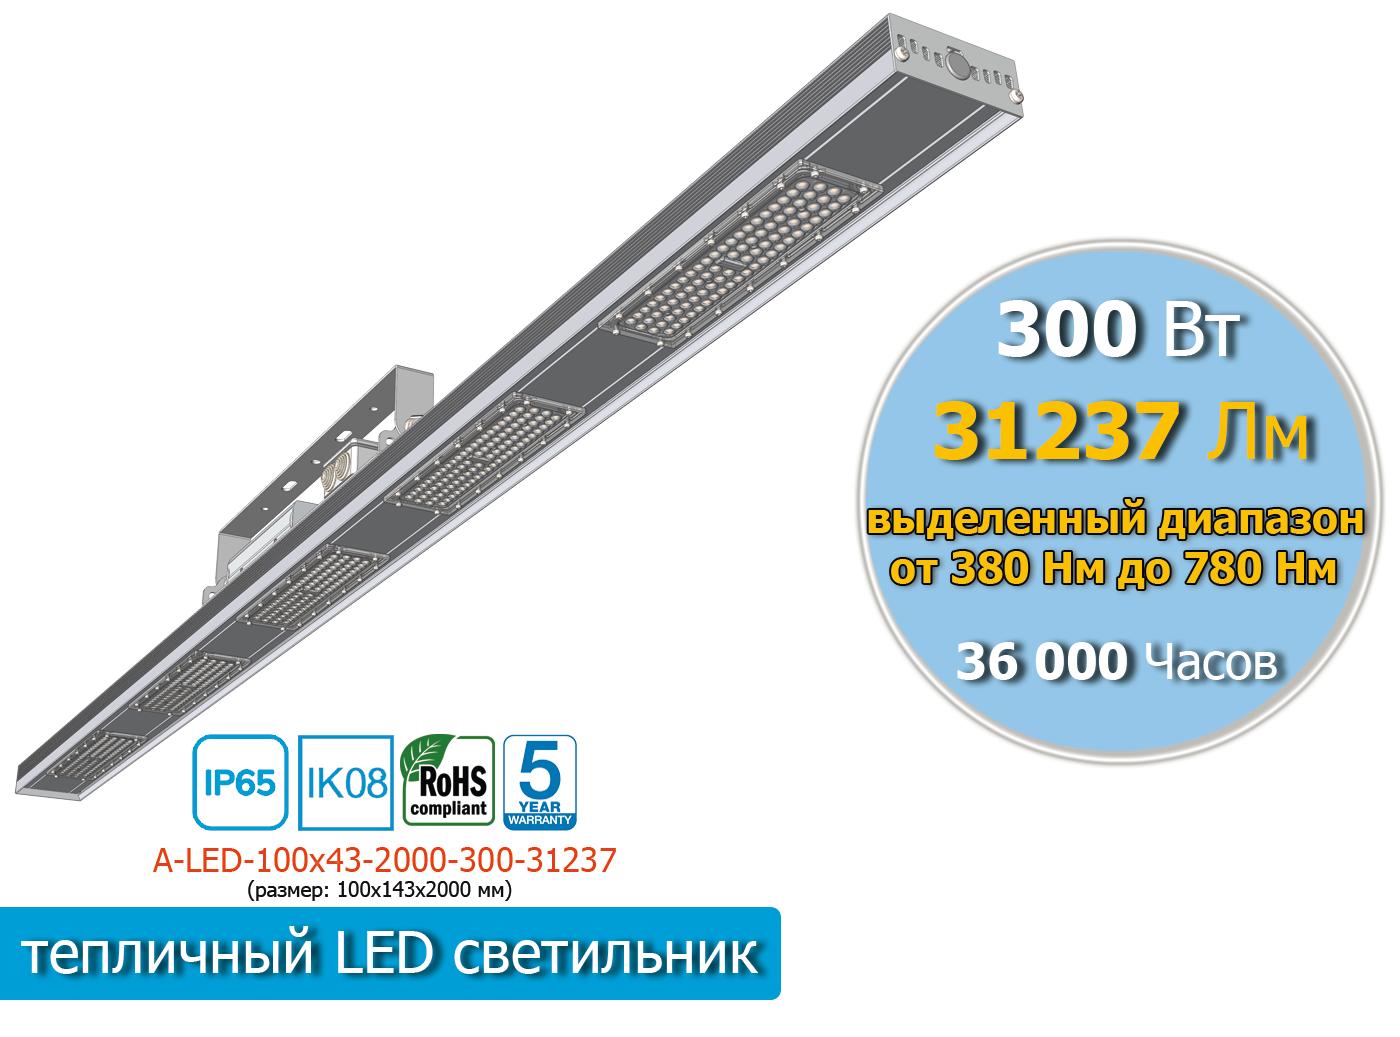 A-LED-100х43-1-2000-300-31237